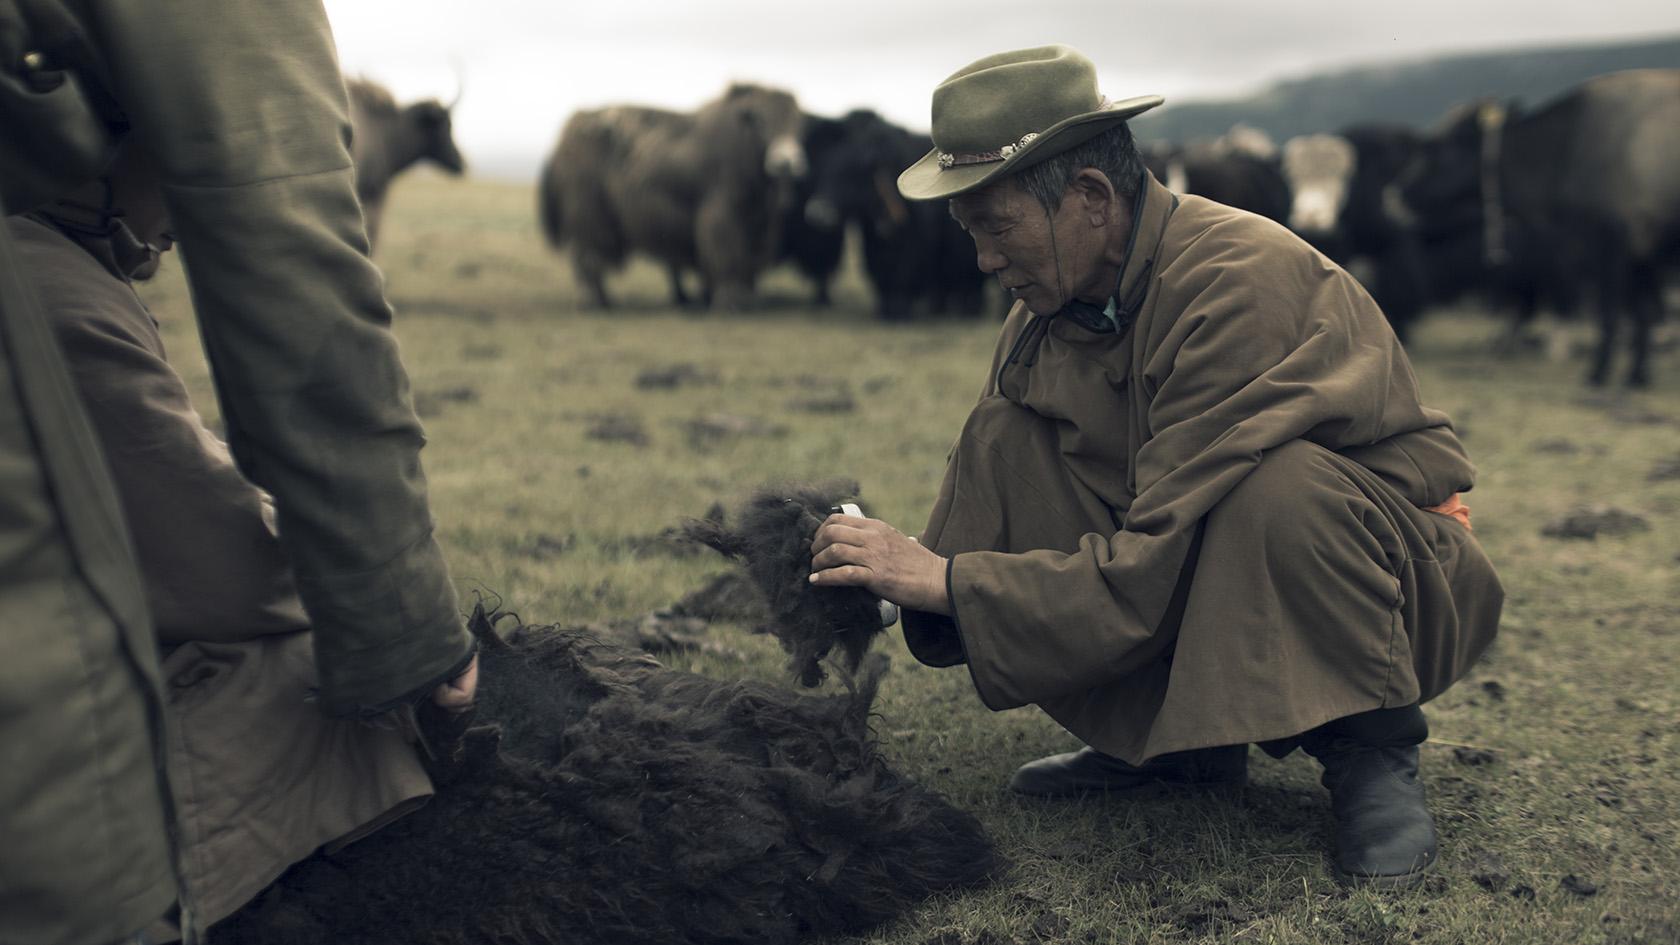 Tengri_mongolia_khangai_noble_fibre_herder.jpg